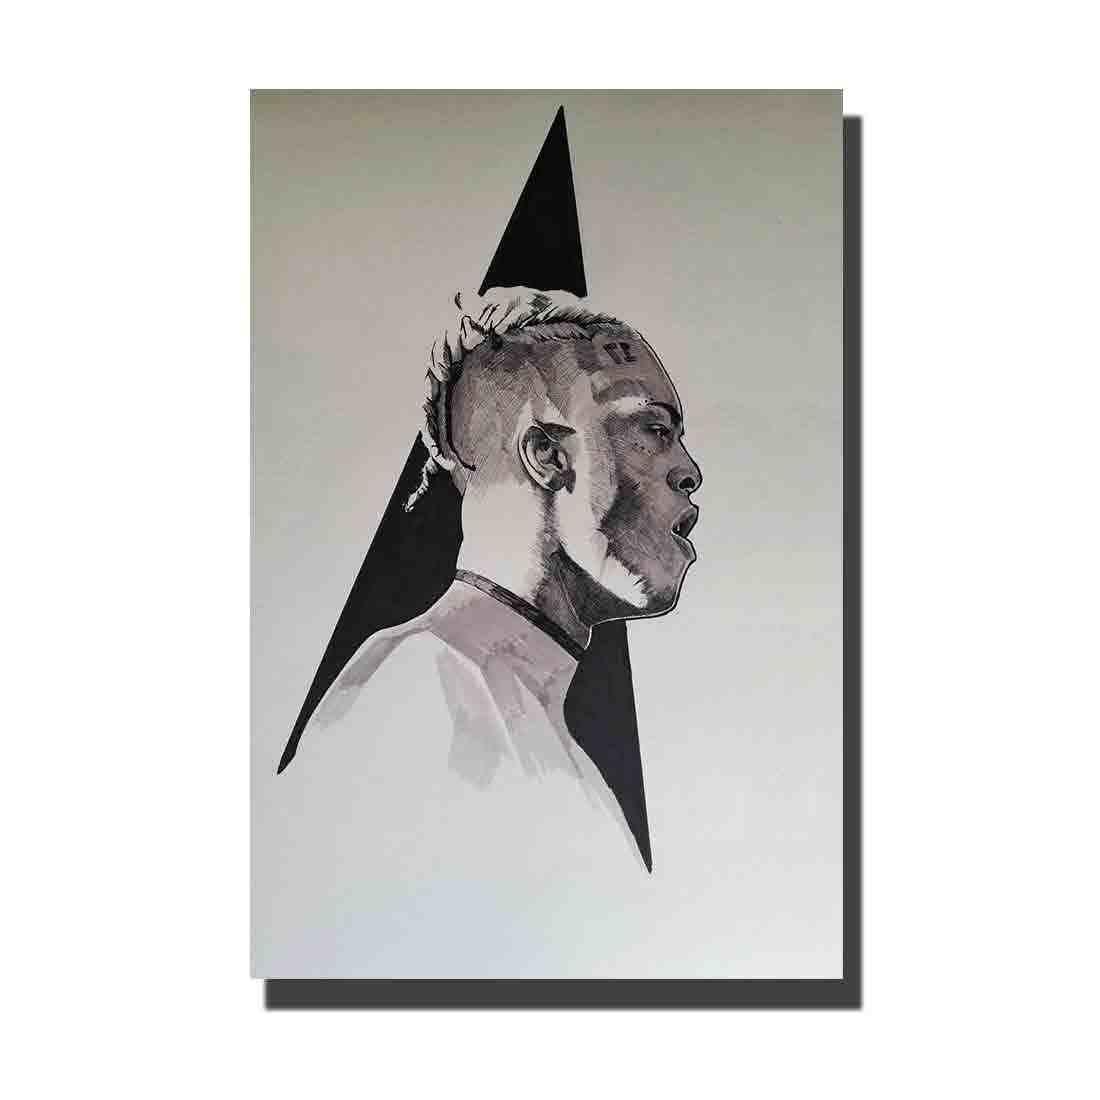 Details about  /B-733 XXXTentacion Rap Hip Hop Music Star Rapper Singer 36 27x40 Fabric Poster